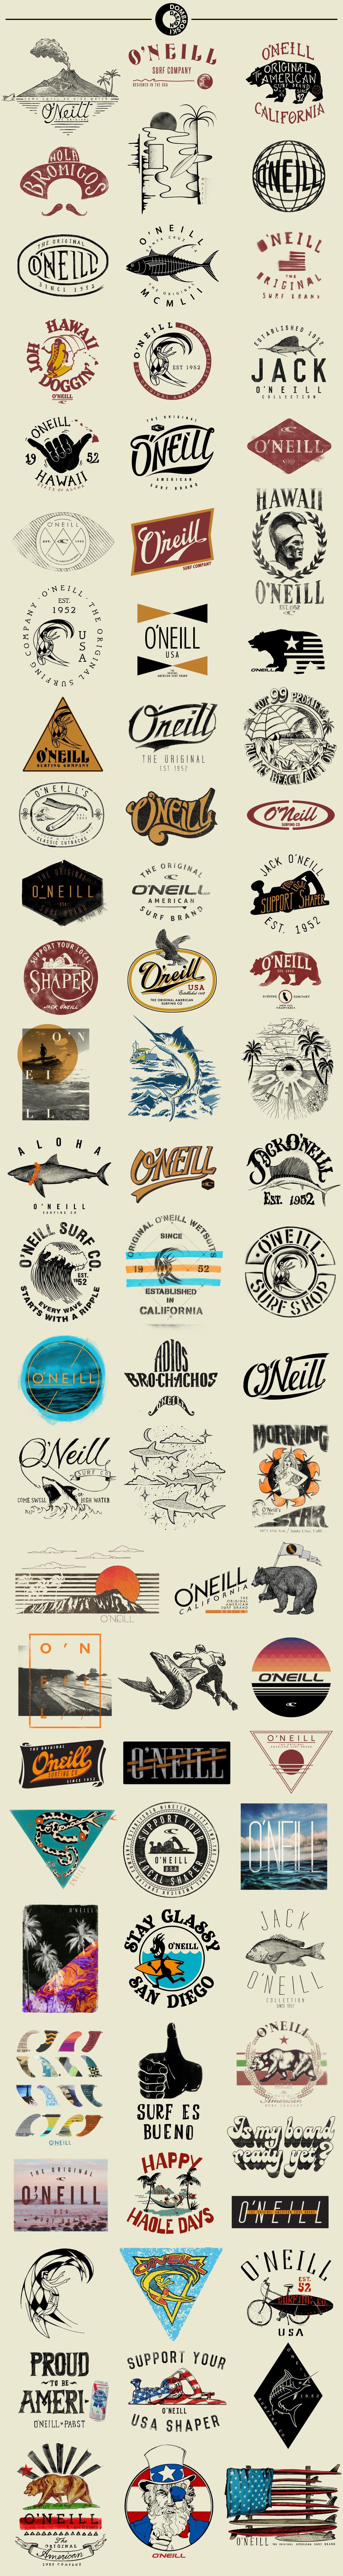 Shirt design brands - Design Inspiration